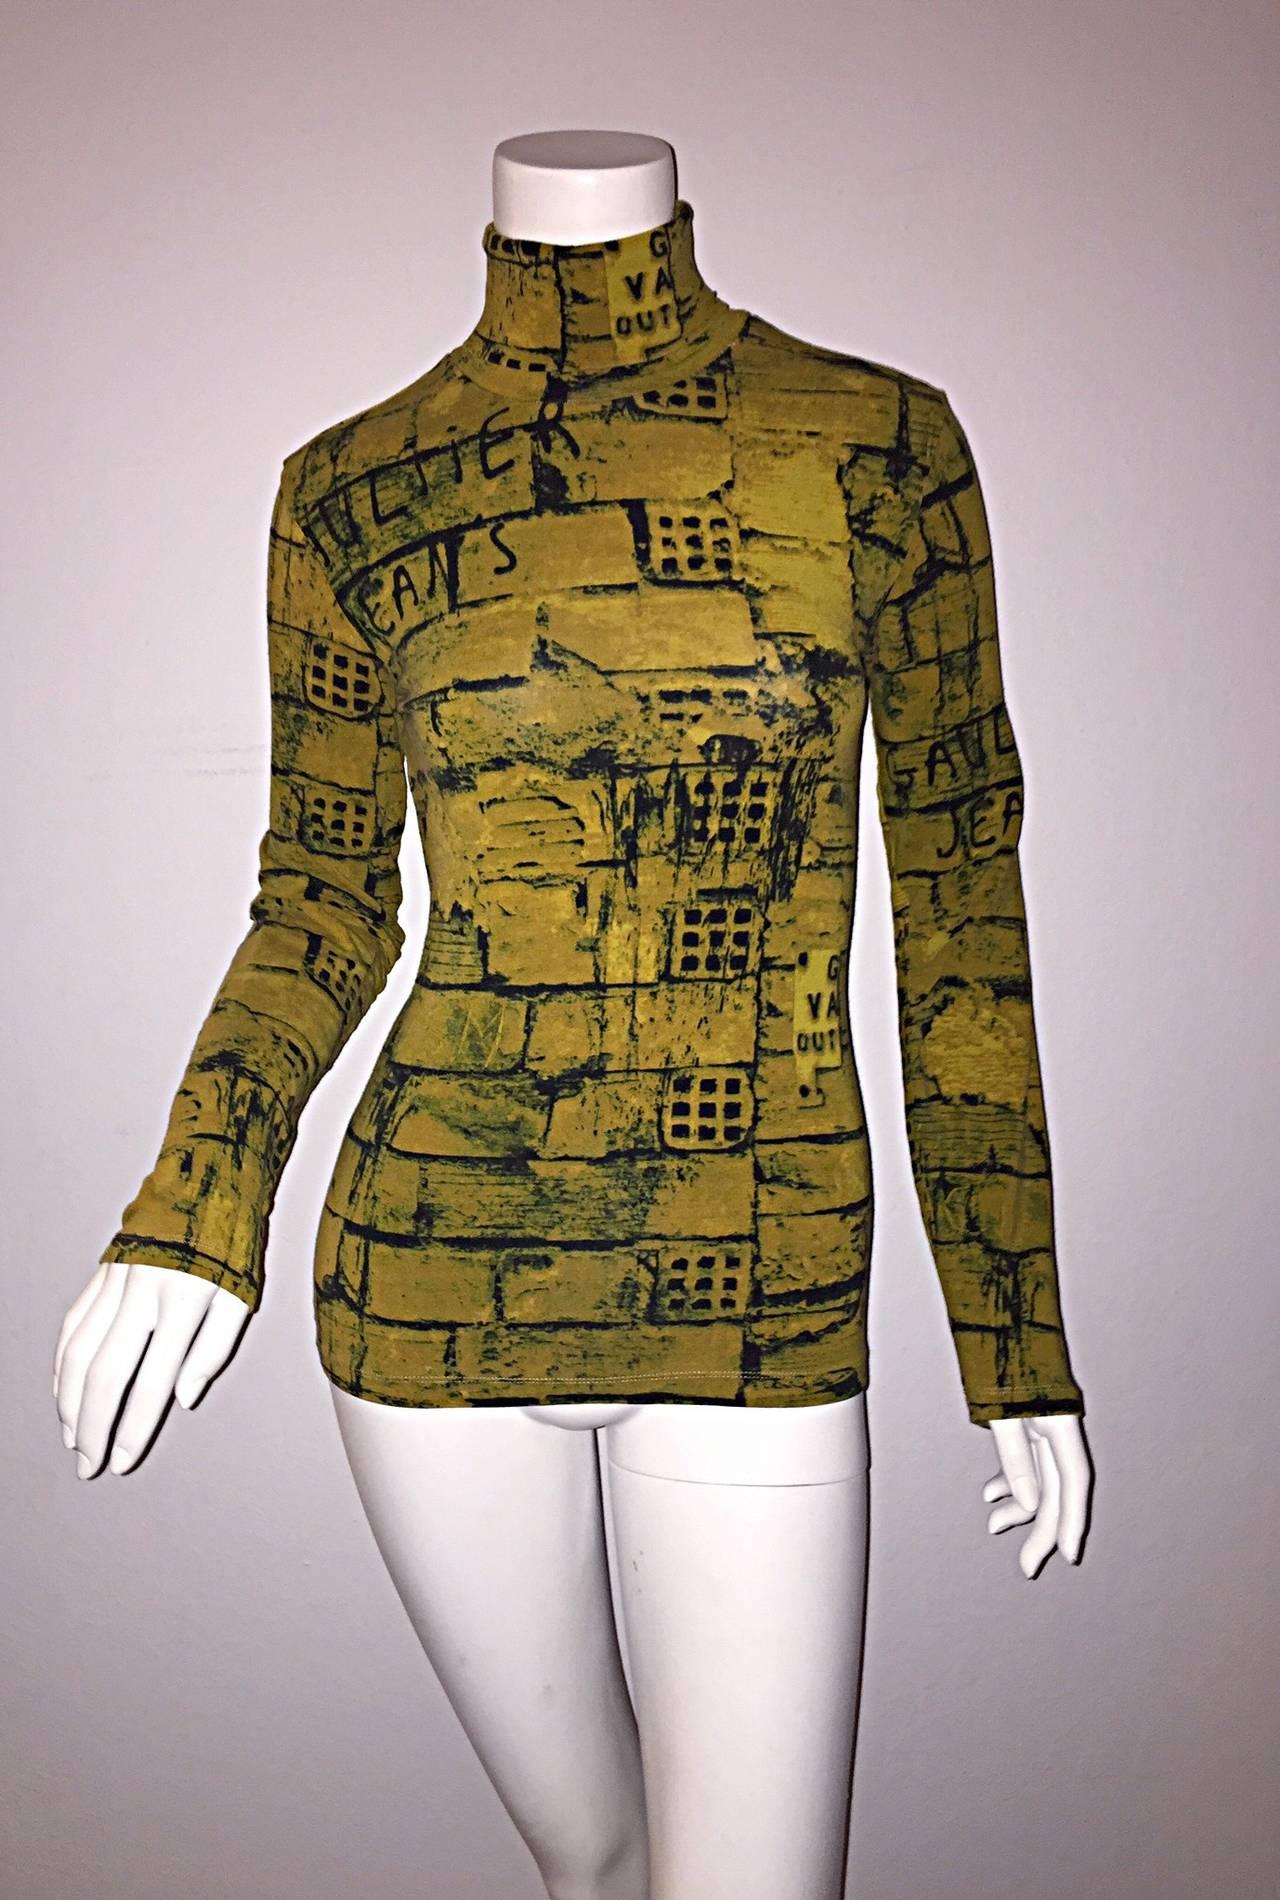 Rare 1990s Vintage Jean Paul Gaultier Graffiti Brick Print Scribble Blouse Shirt 2